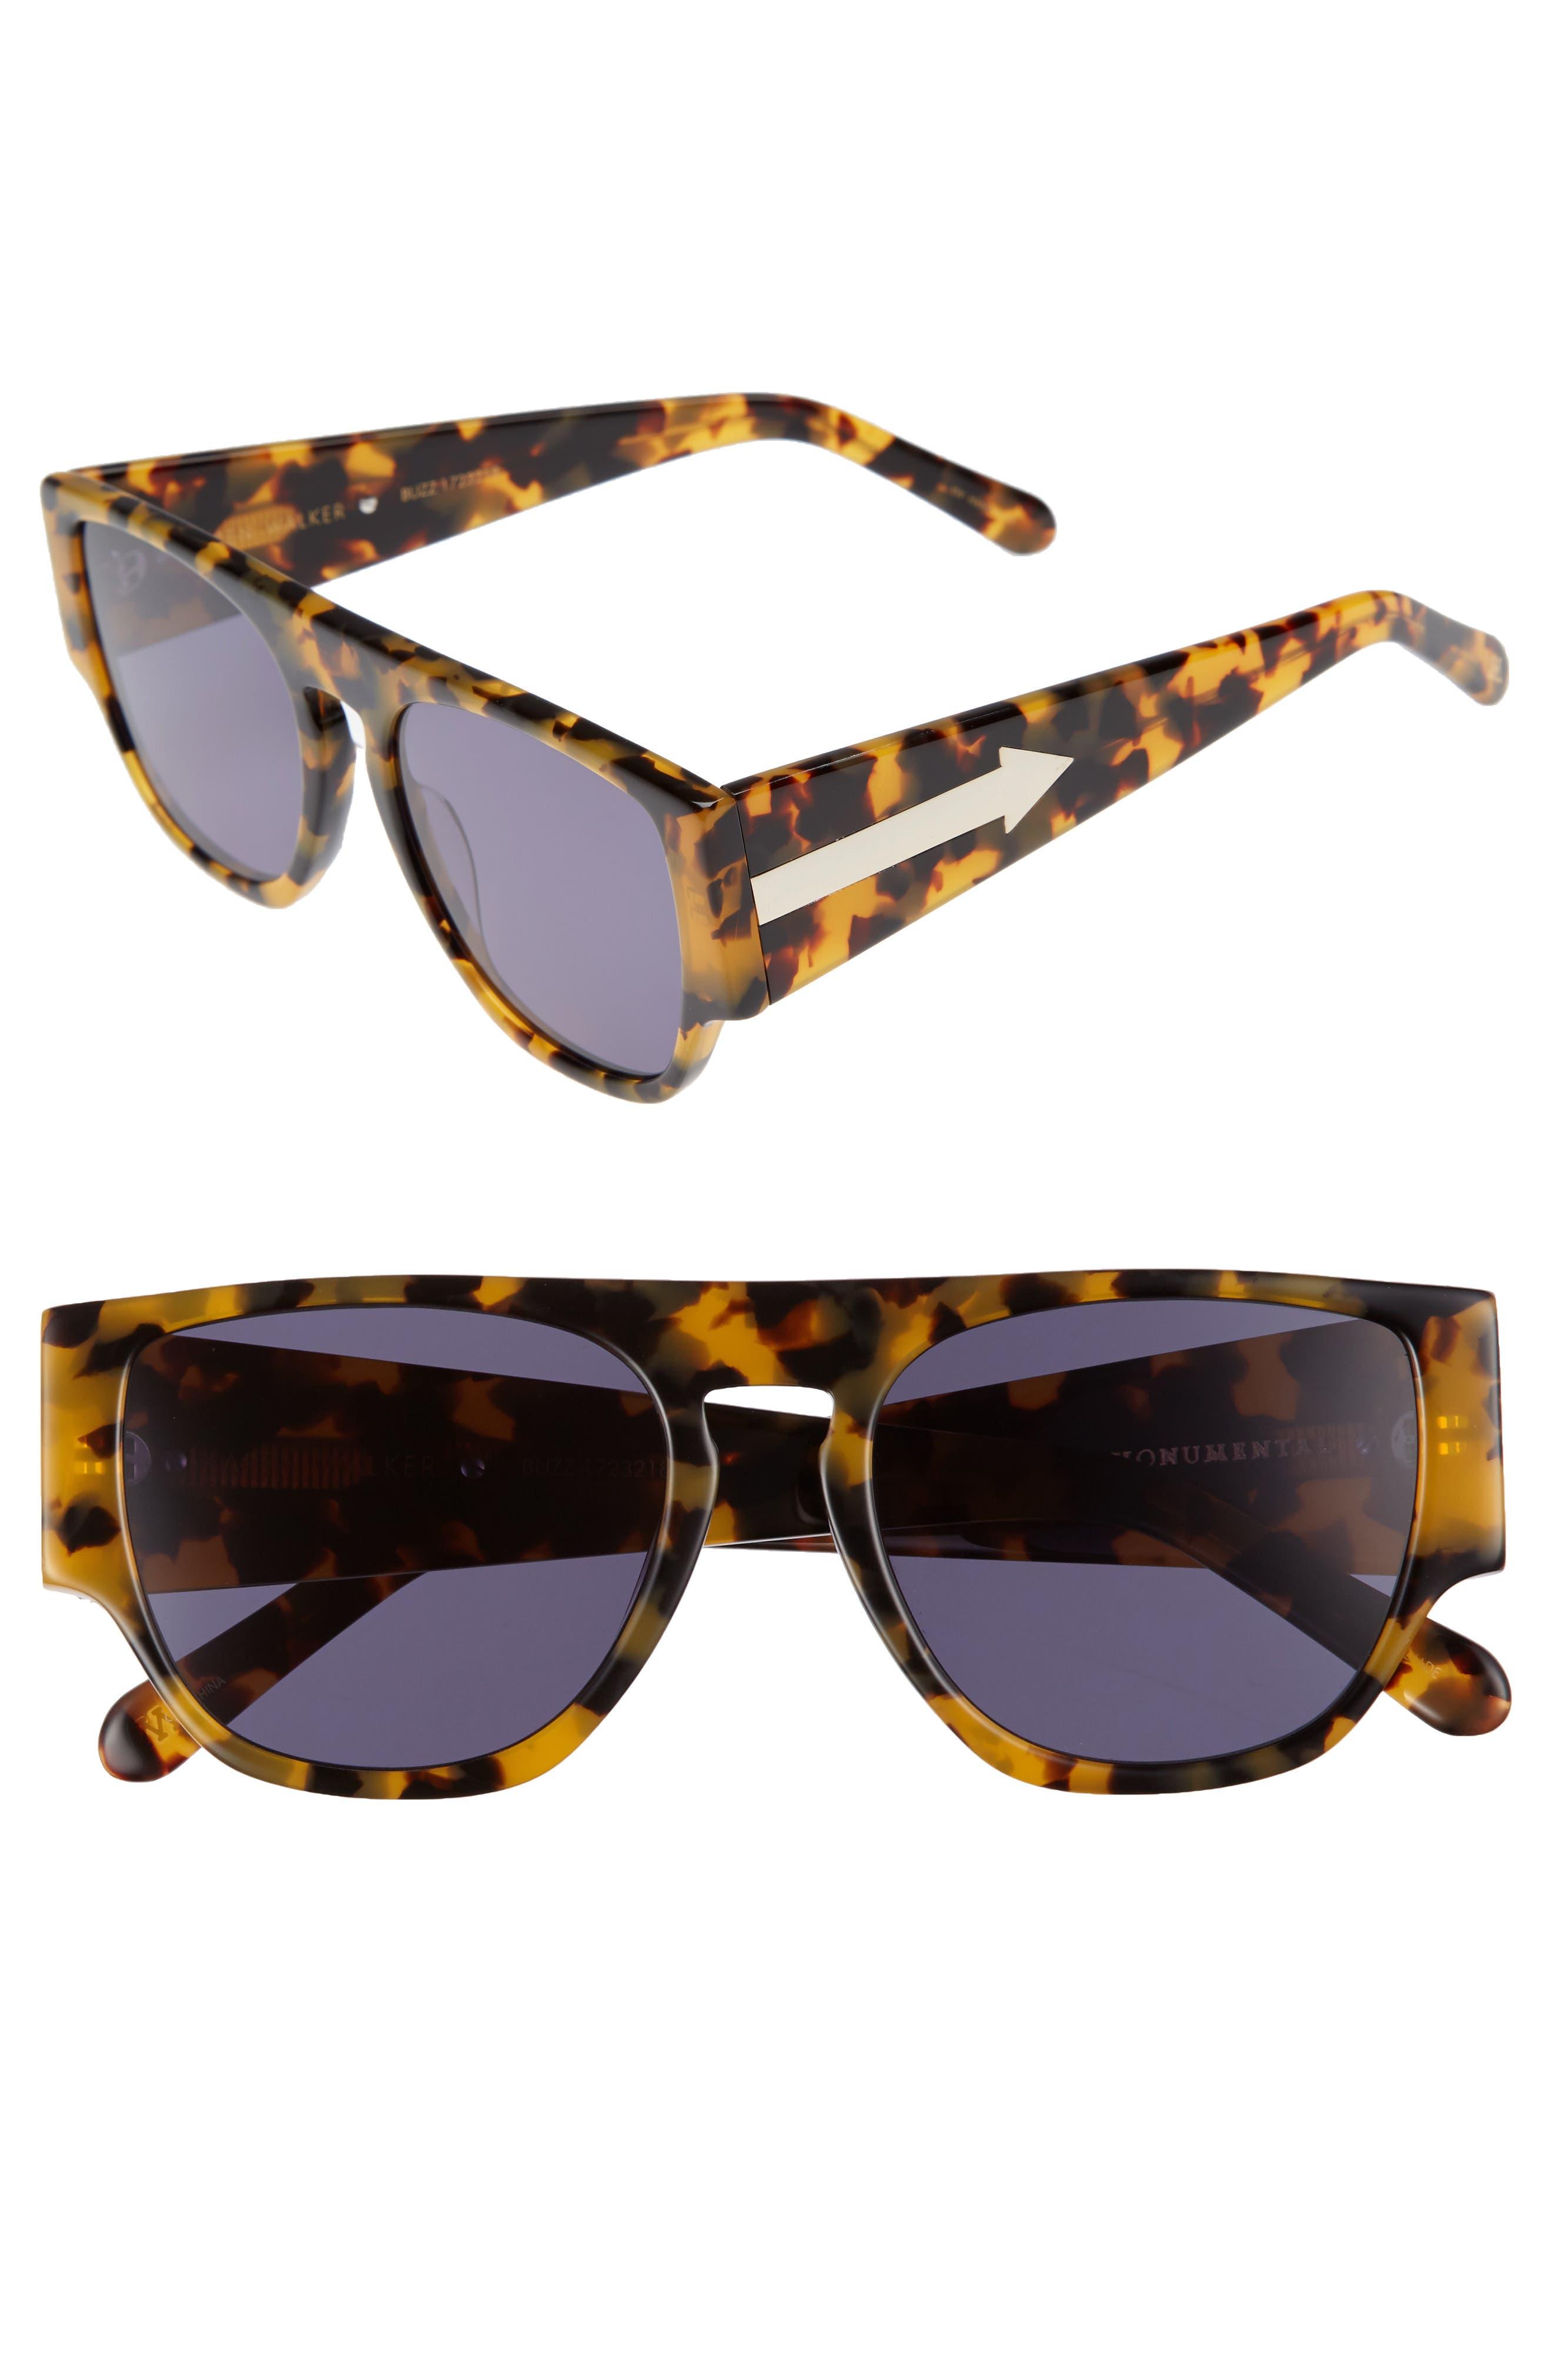 x Monumental Buzz 54mm Polarized Sunglasses,                             Main thumbnail 1, color,                             Crazy Tortoise